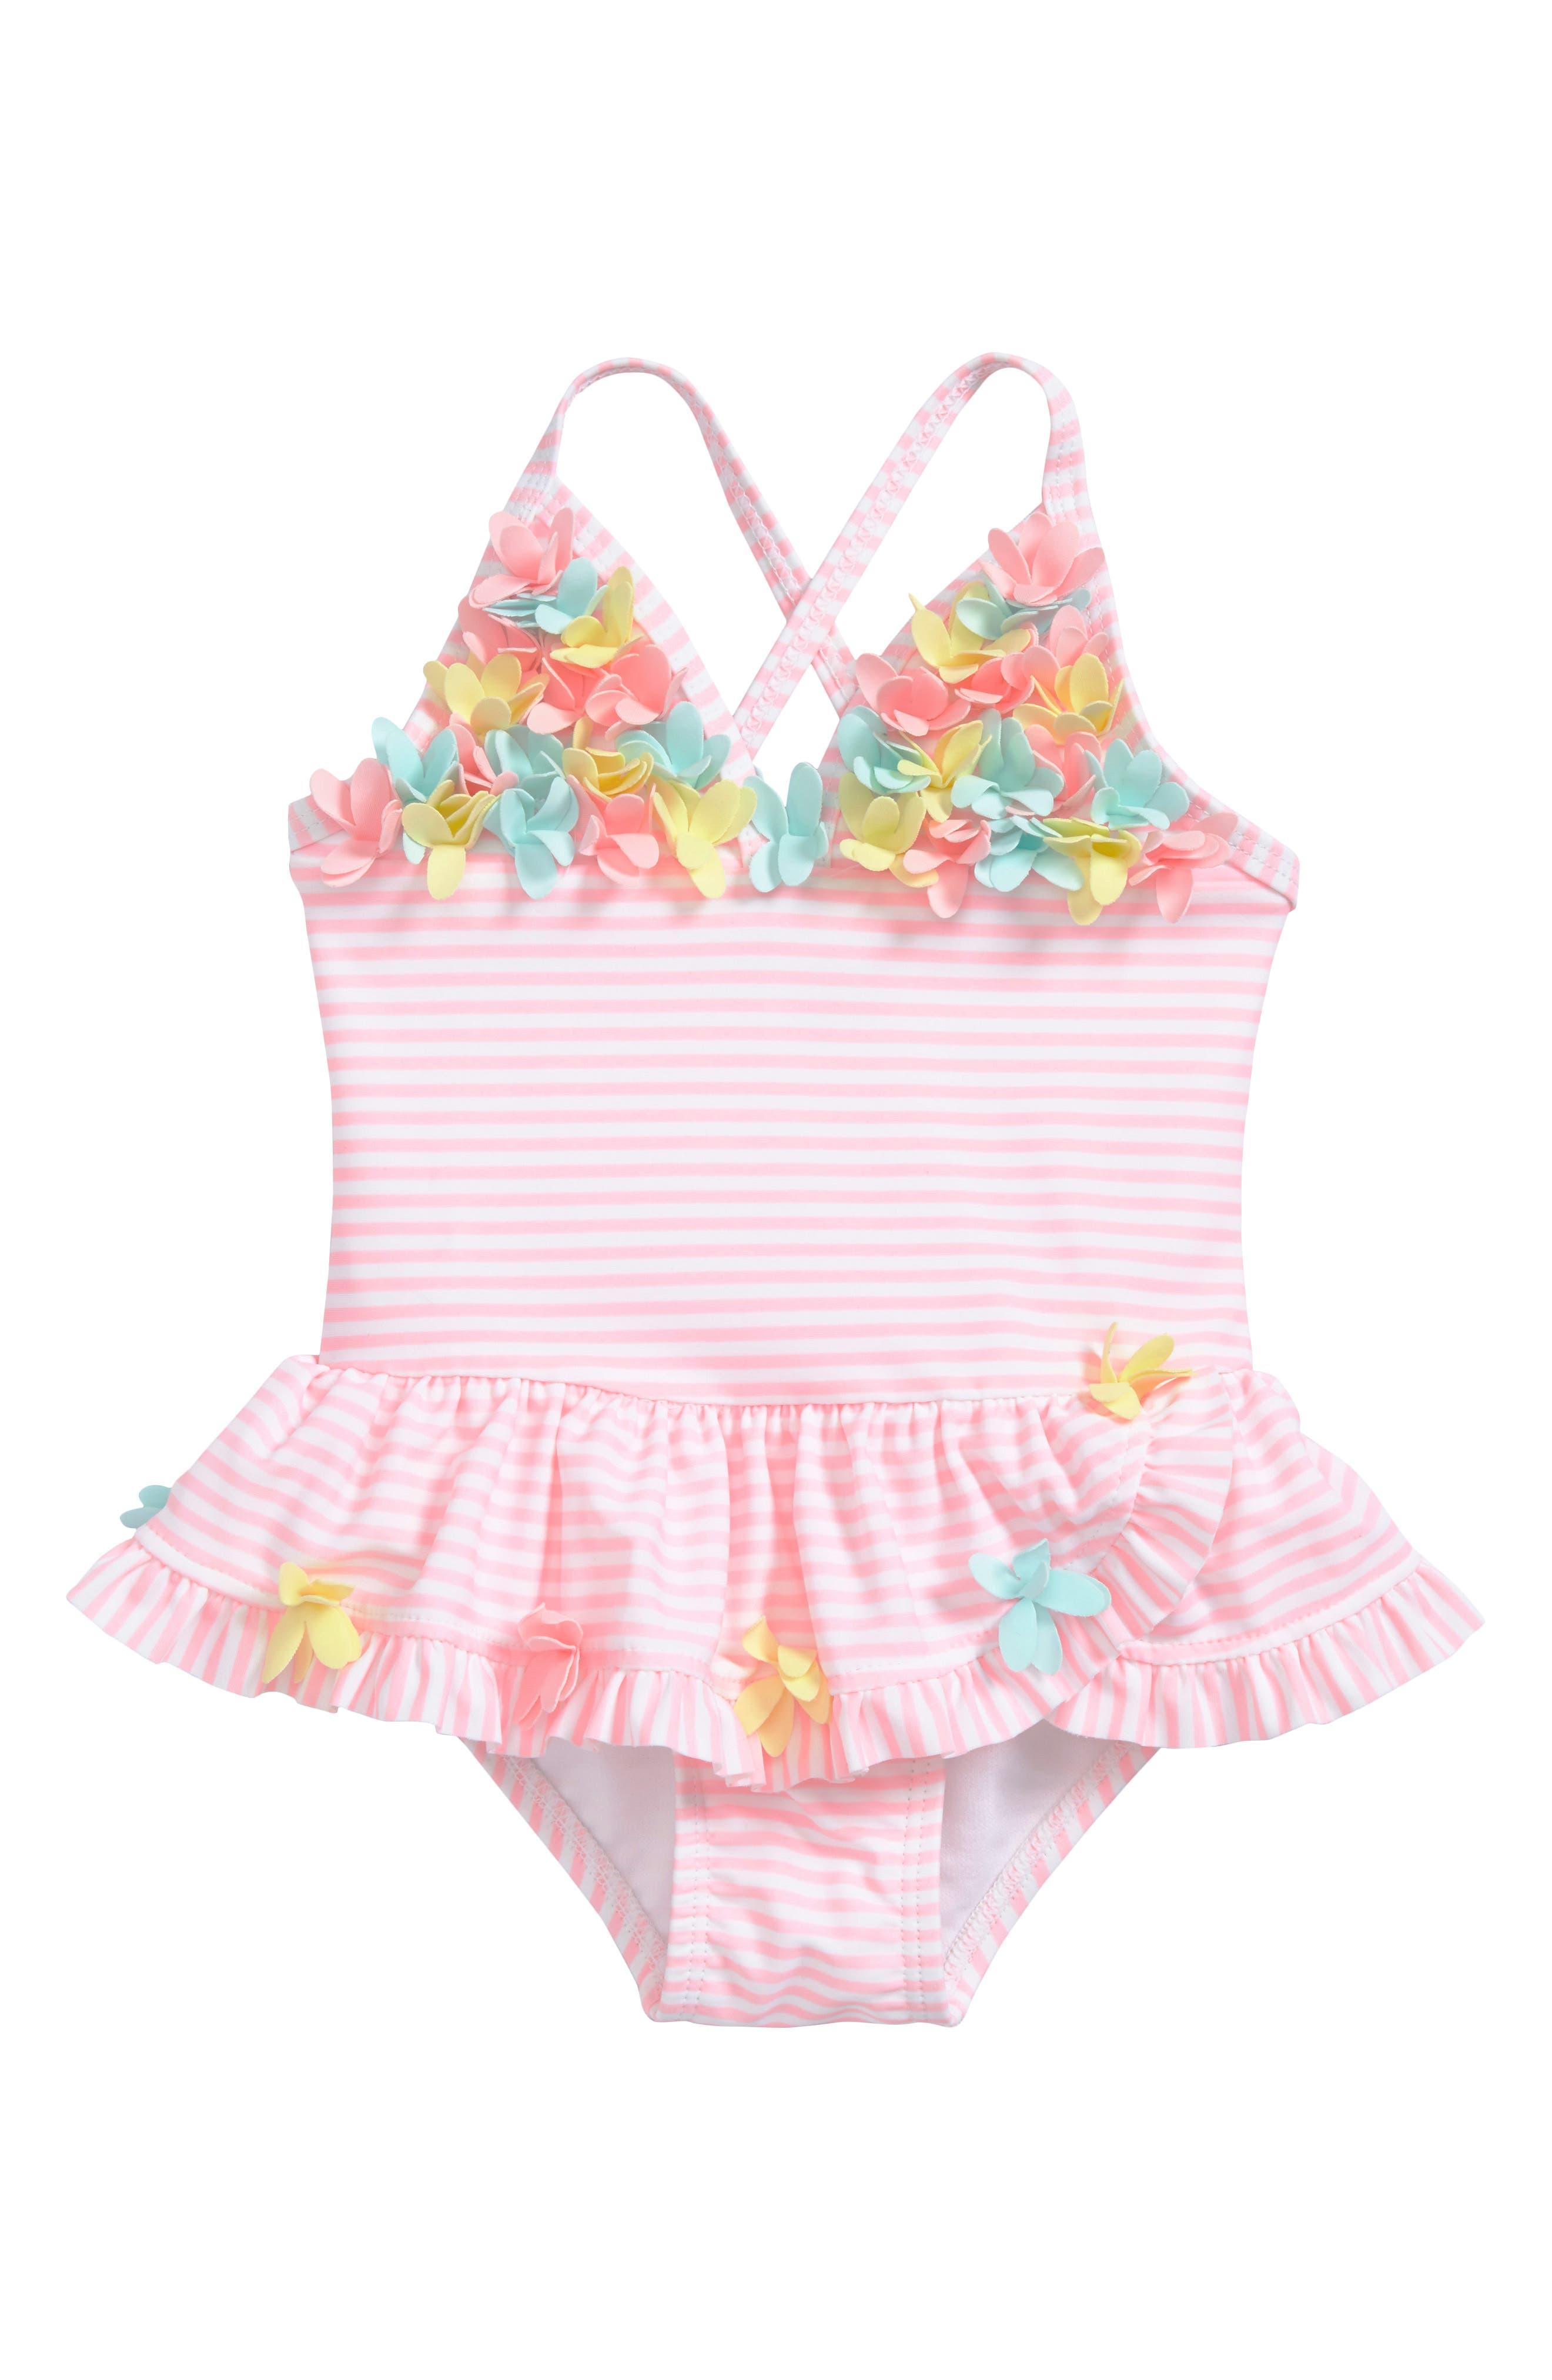 Flower Appliqué Skirted One-Piece Swimsuit,                         Main,                         color, 684